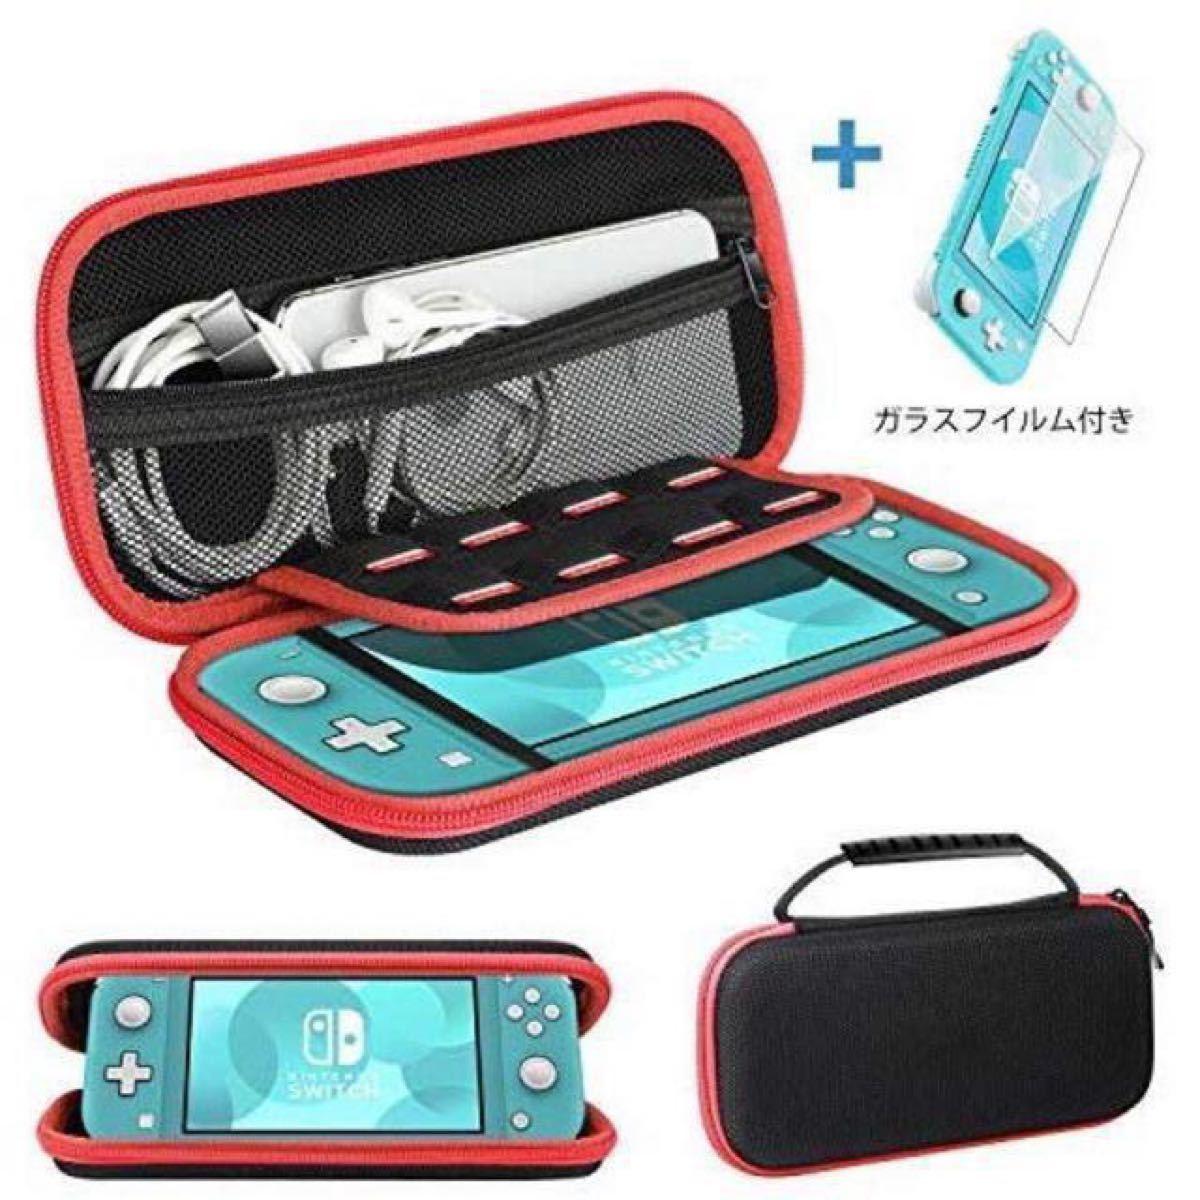 Nintendo Switch 任天堂スイッチケース 収納バッグ Switch